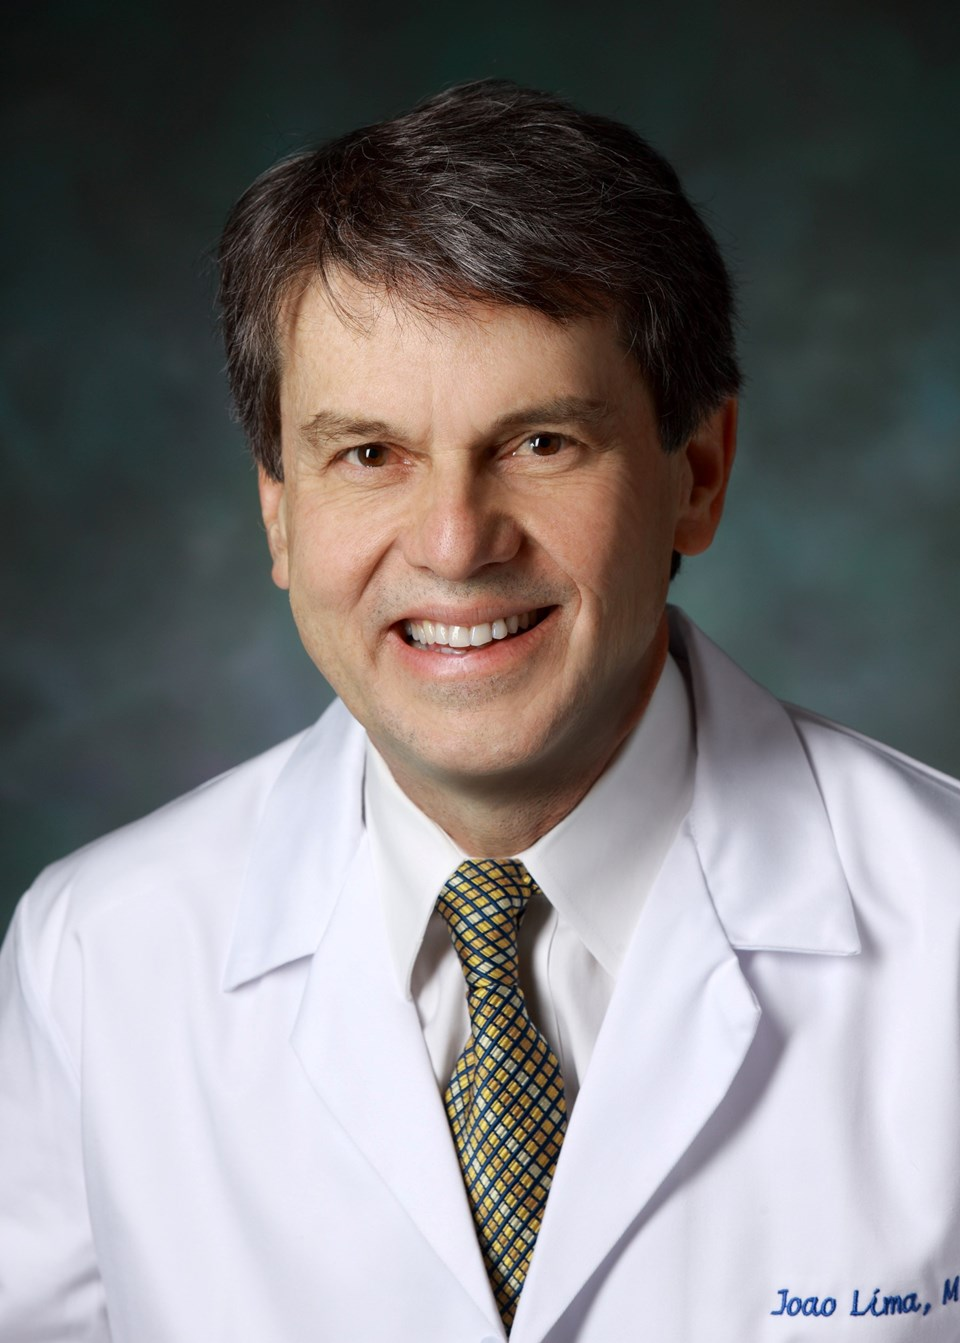 Prof. Dr. Joao Lima